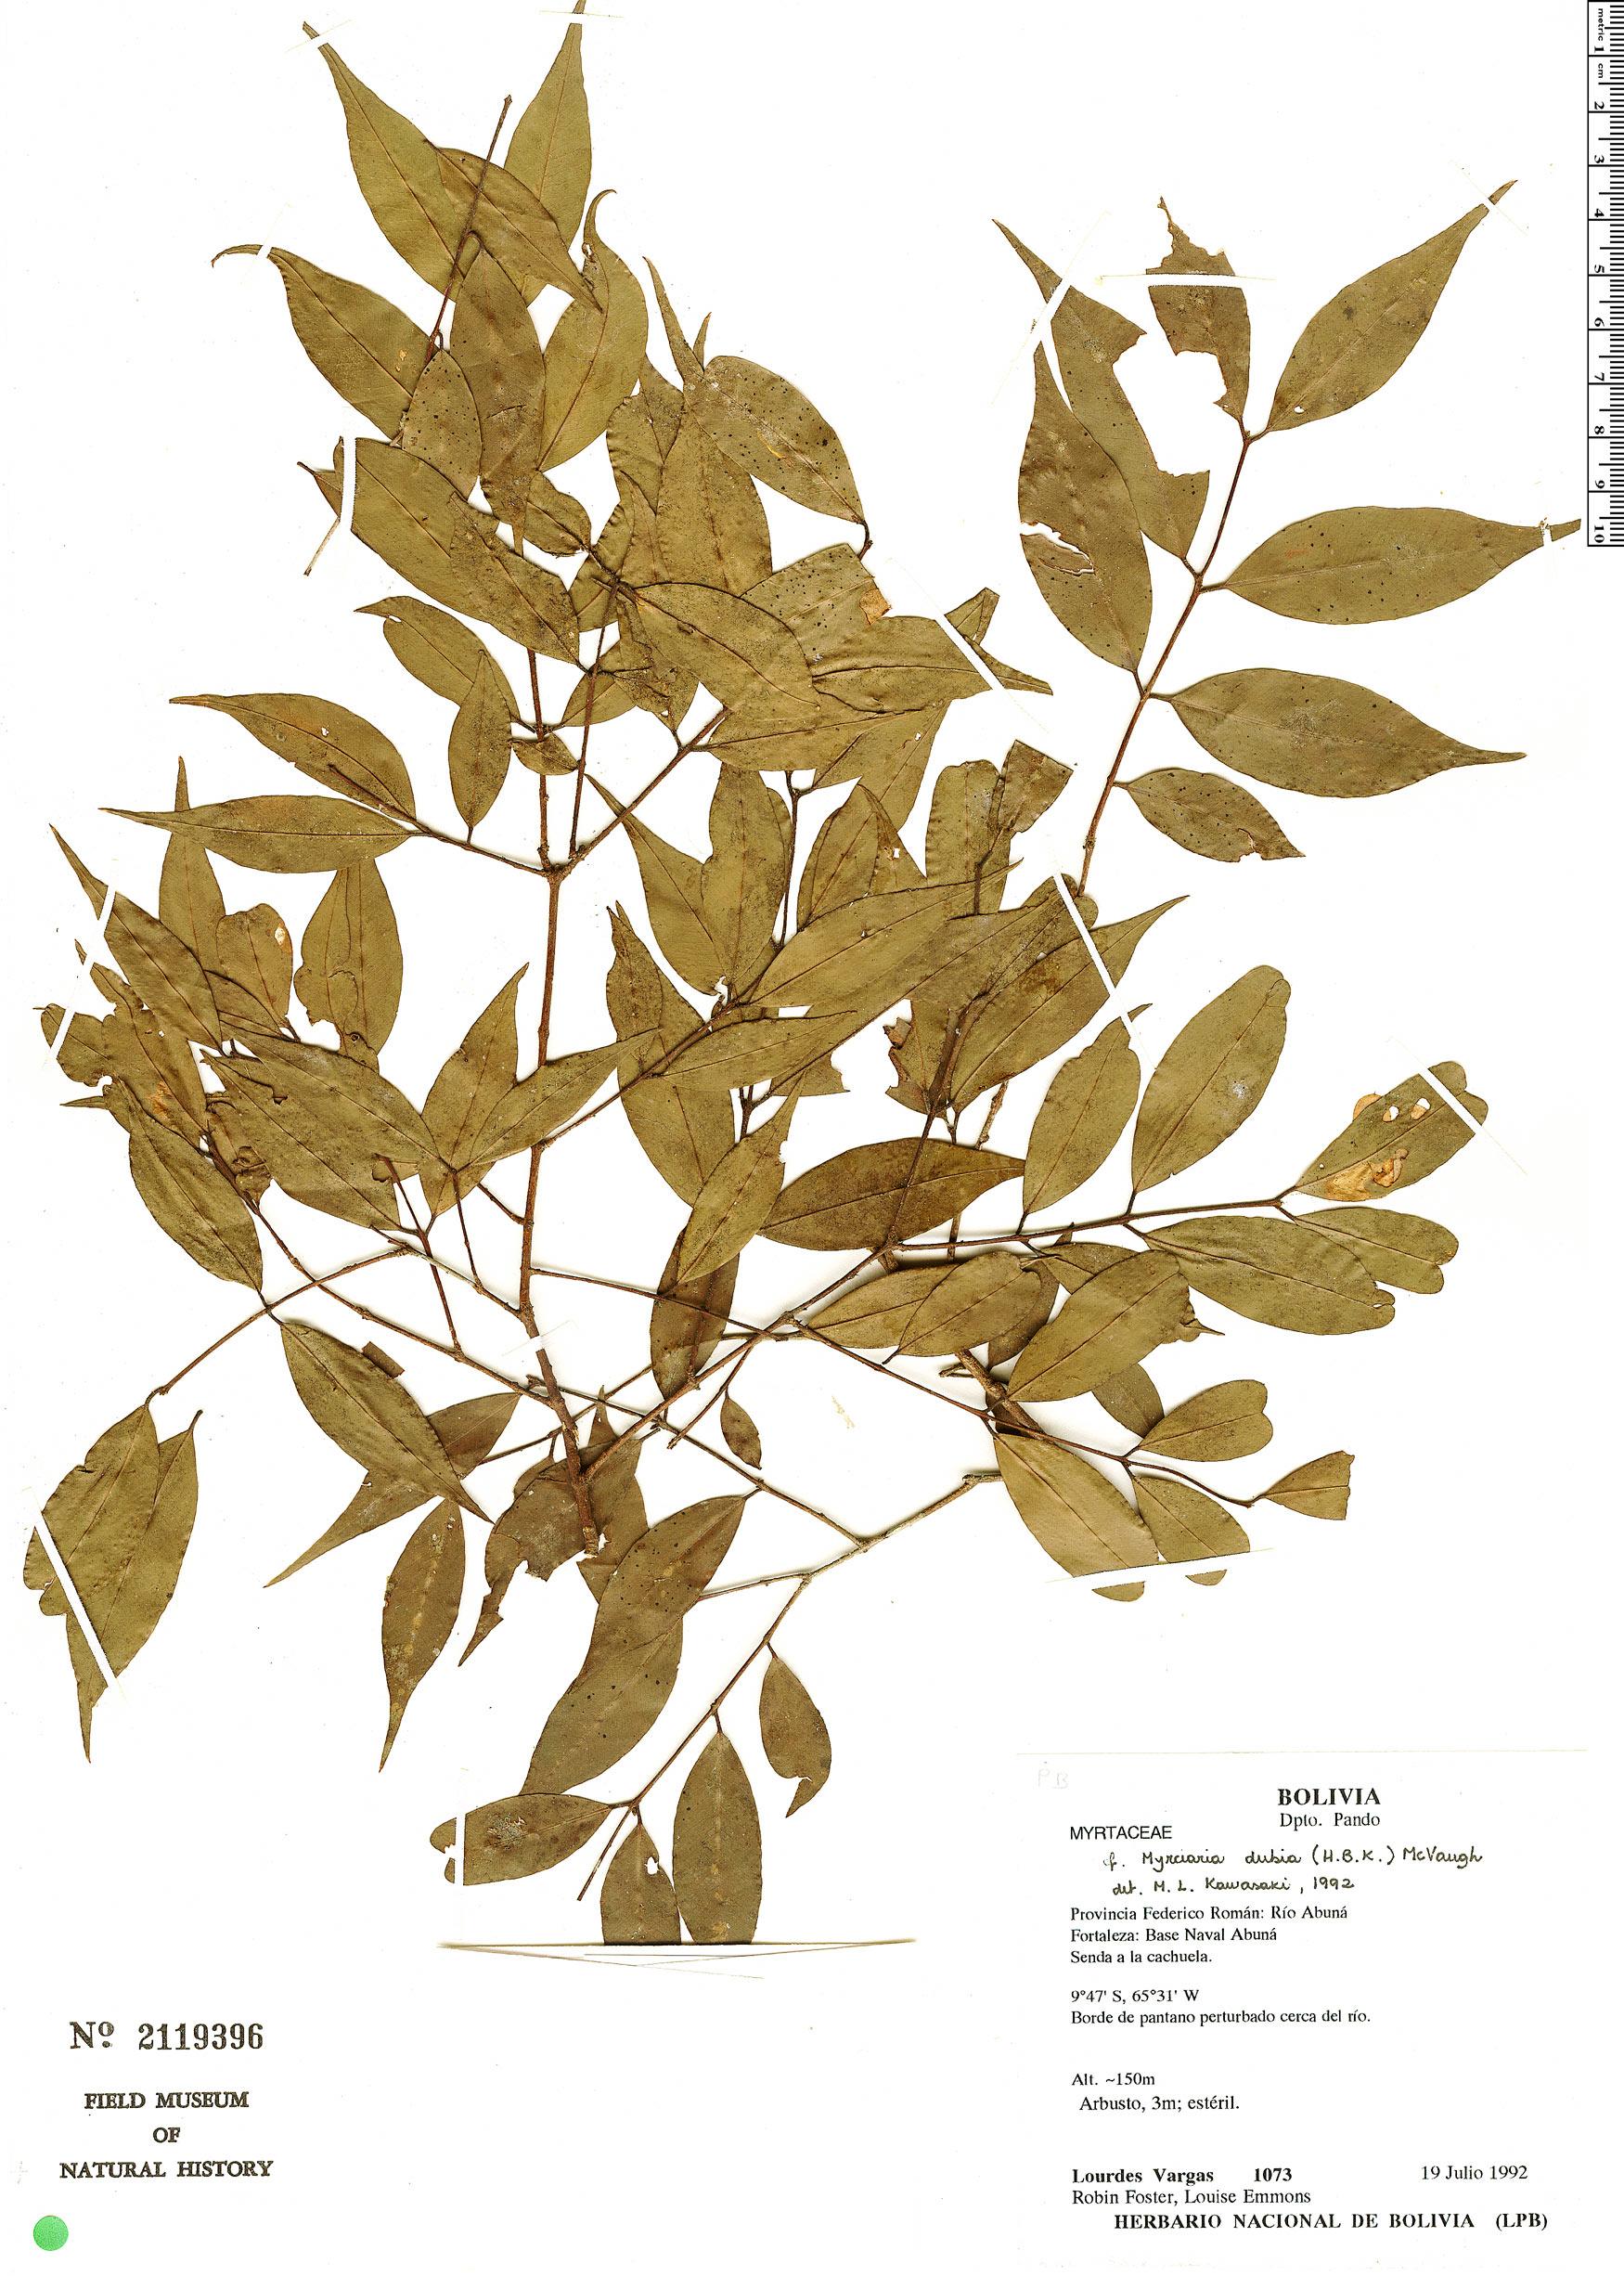 Specimen: Myrciaria dubia